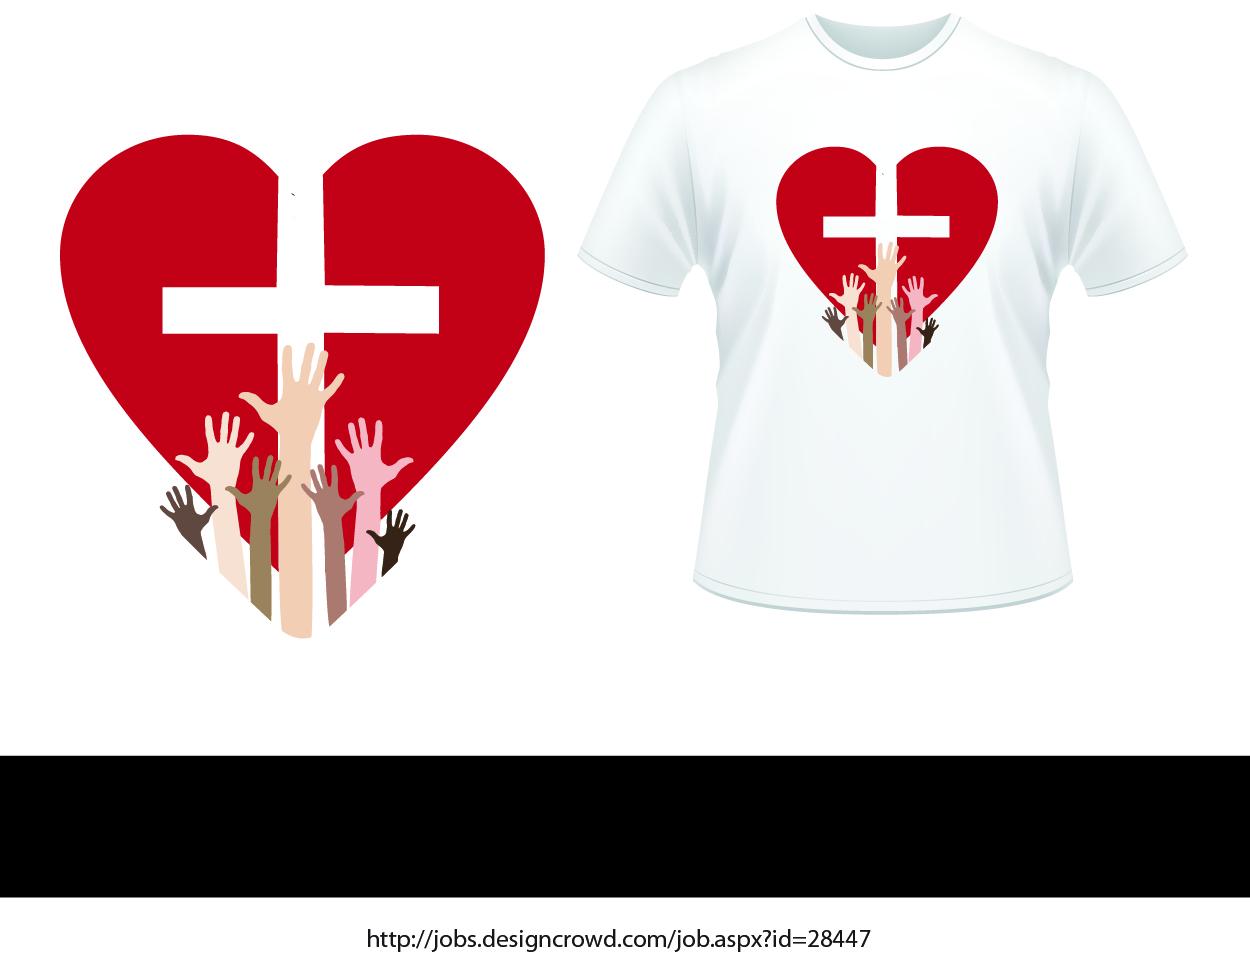 T shirt design job - T Shirt Design By Daniel Lopez Denham For Christian Missions T Shirt Design Project